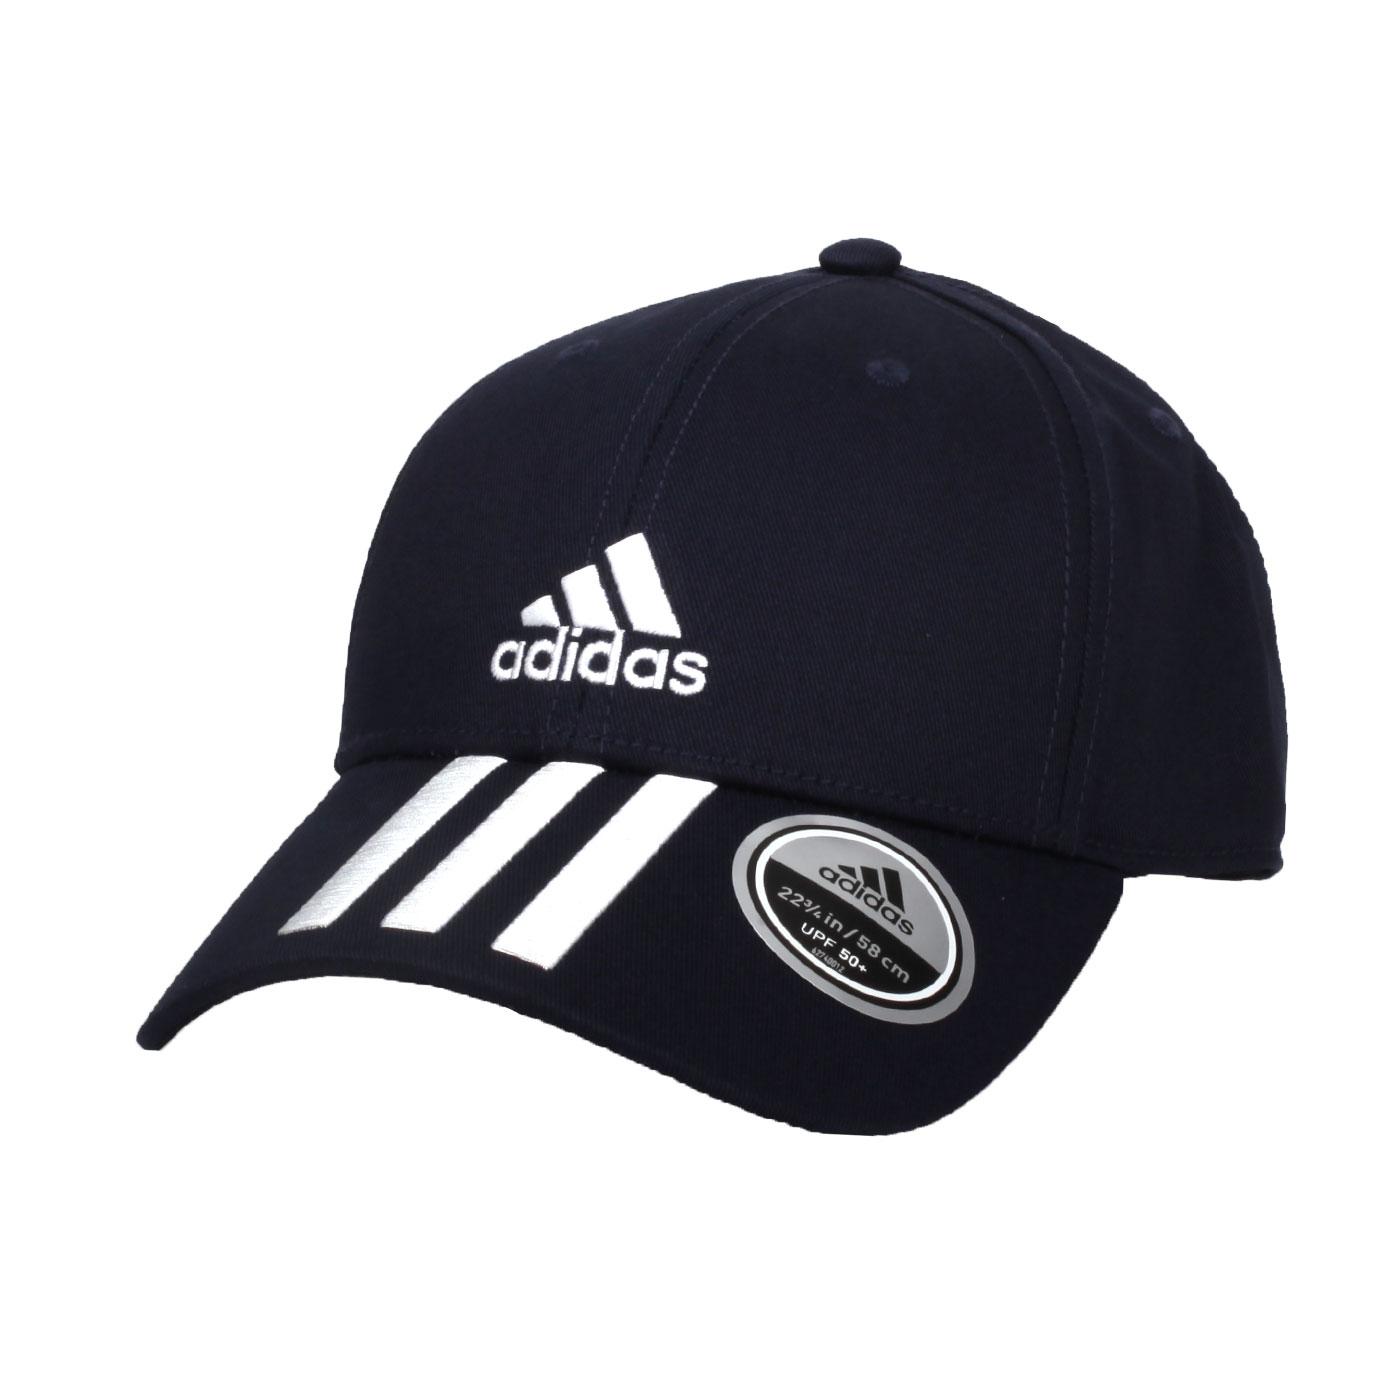 ADIDAS 運動帽 FK0894 - 丈青白